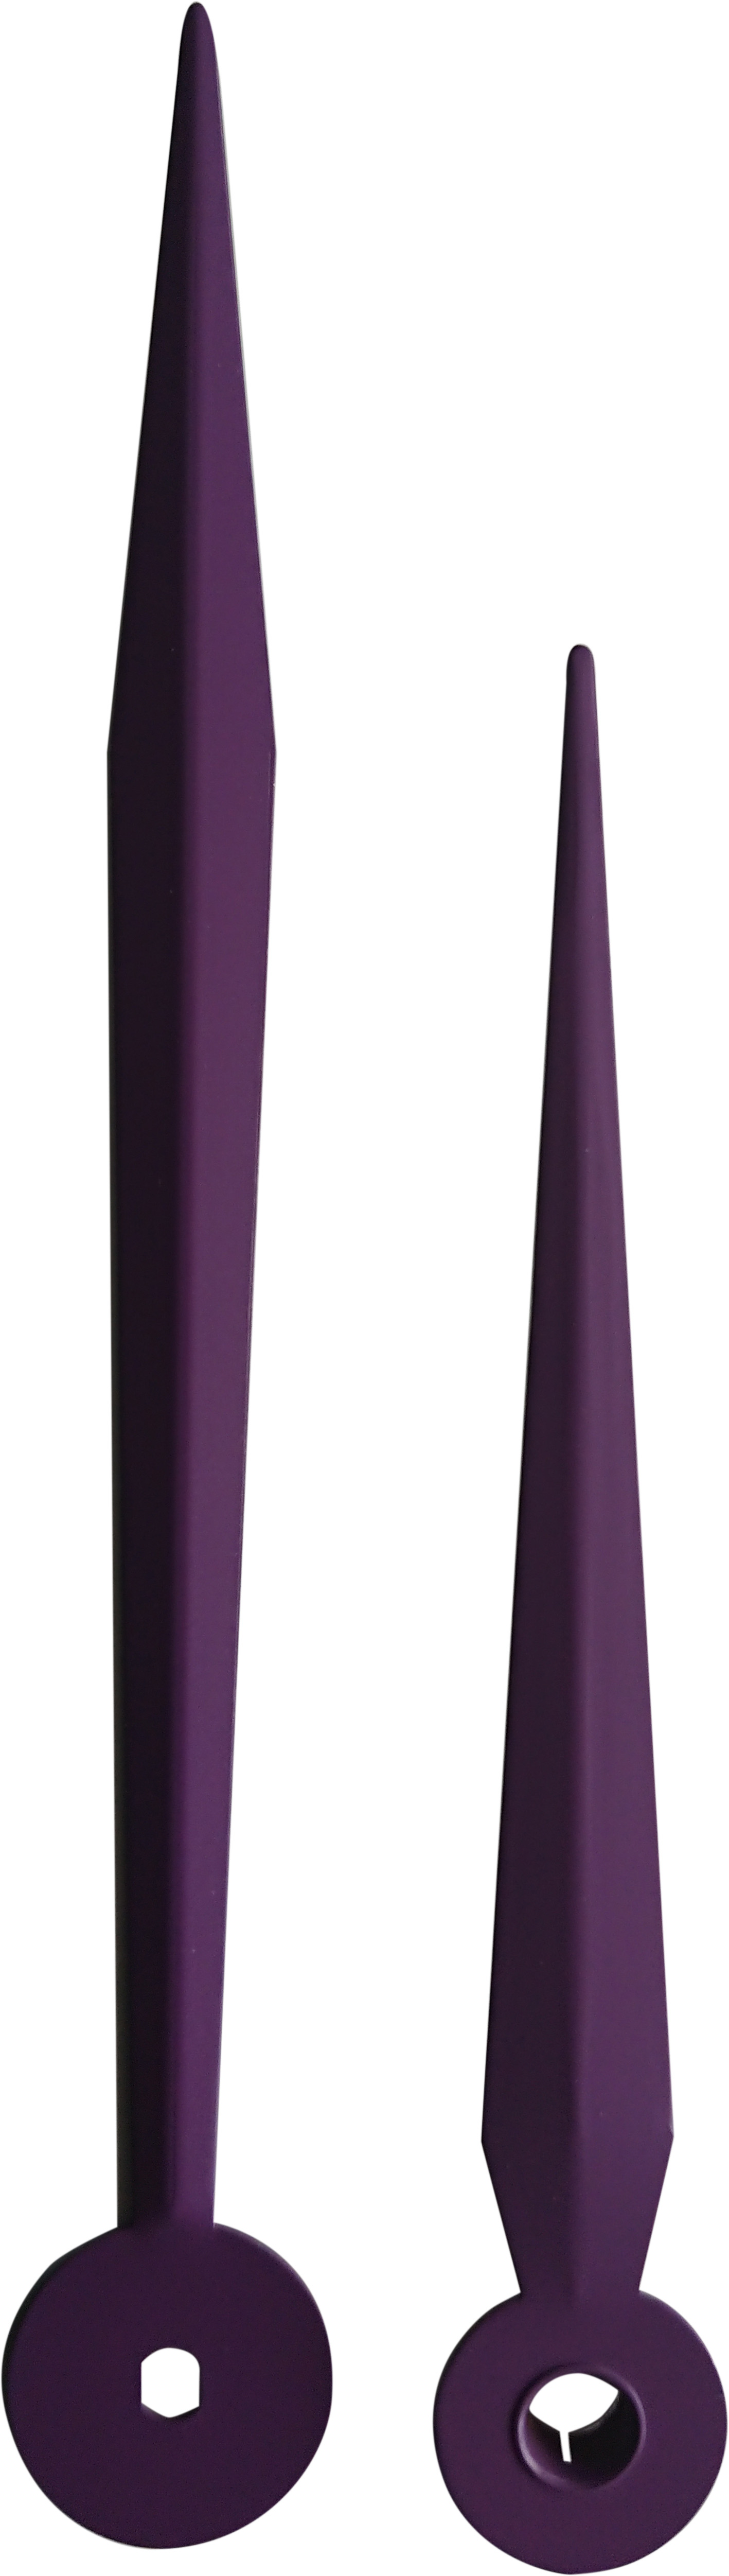 Euronormzeiger lila Aluminium 123/94mm